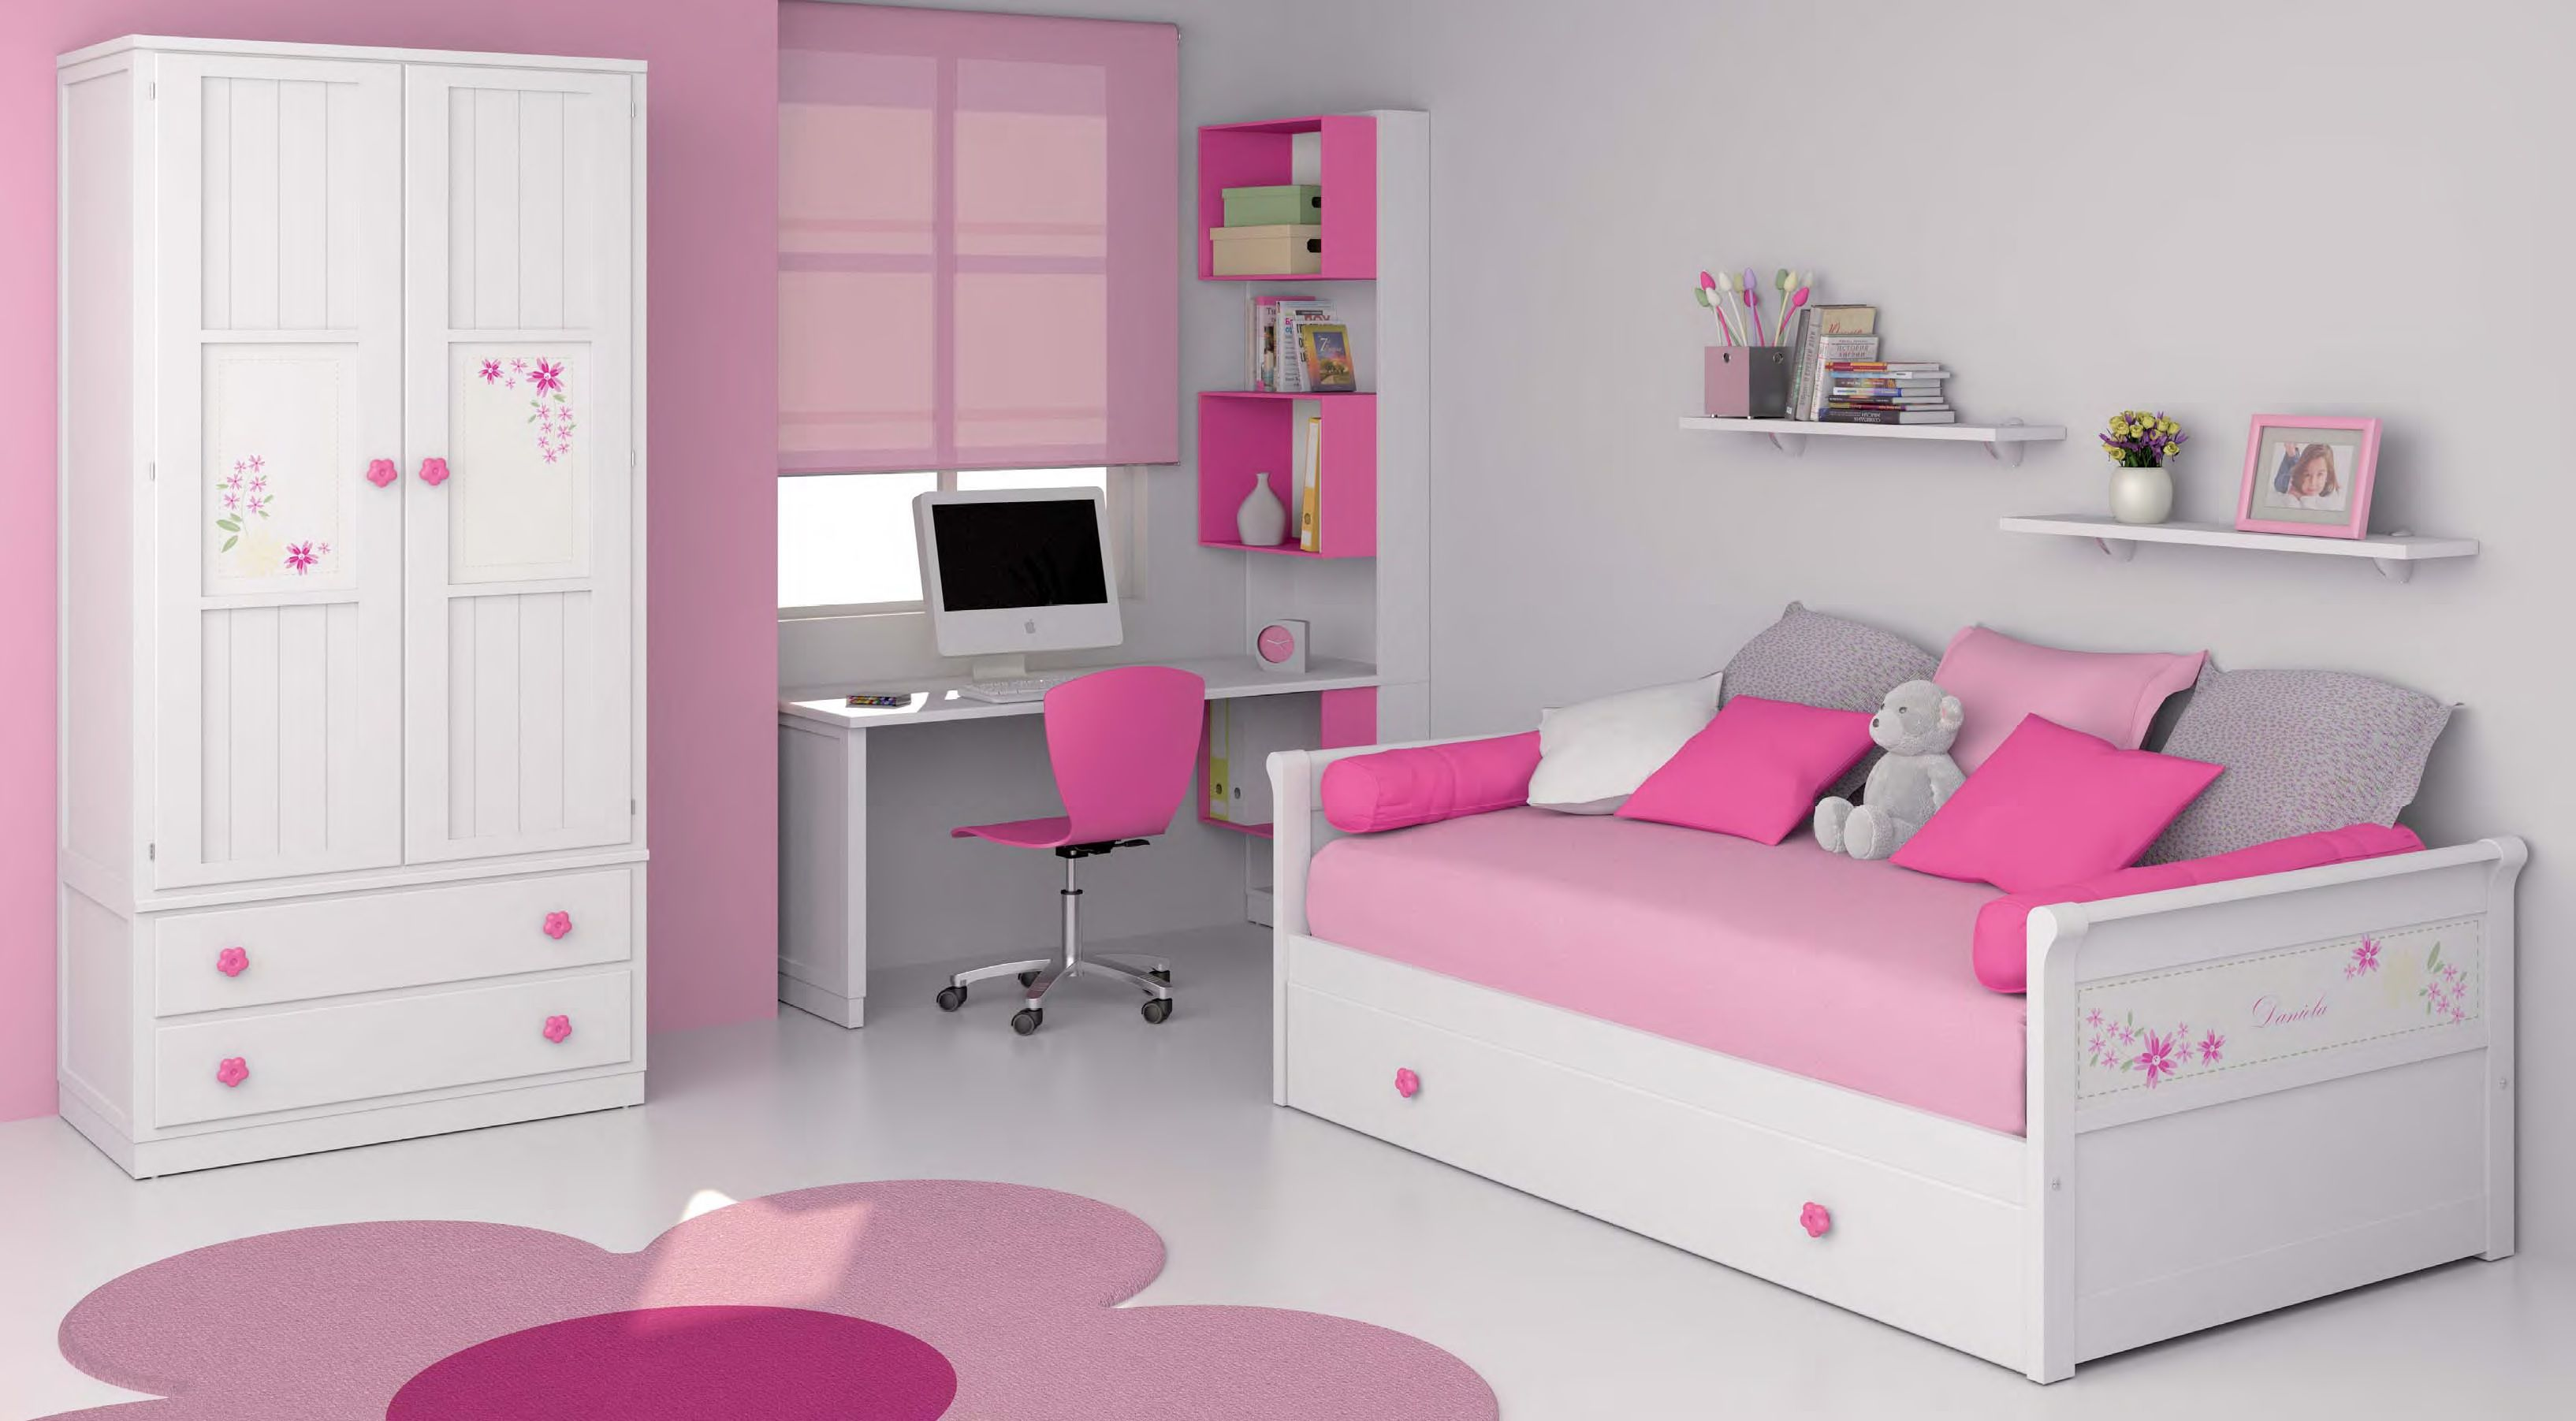 Dormitorios Juveniles Buscar Con Google Nenes Pinterest  # Muebles Hipopotamo En Zaragoza